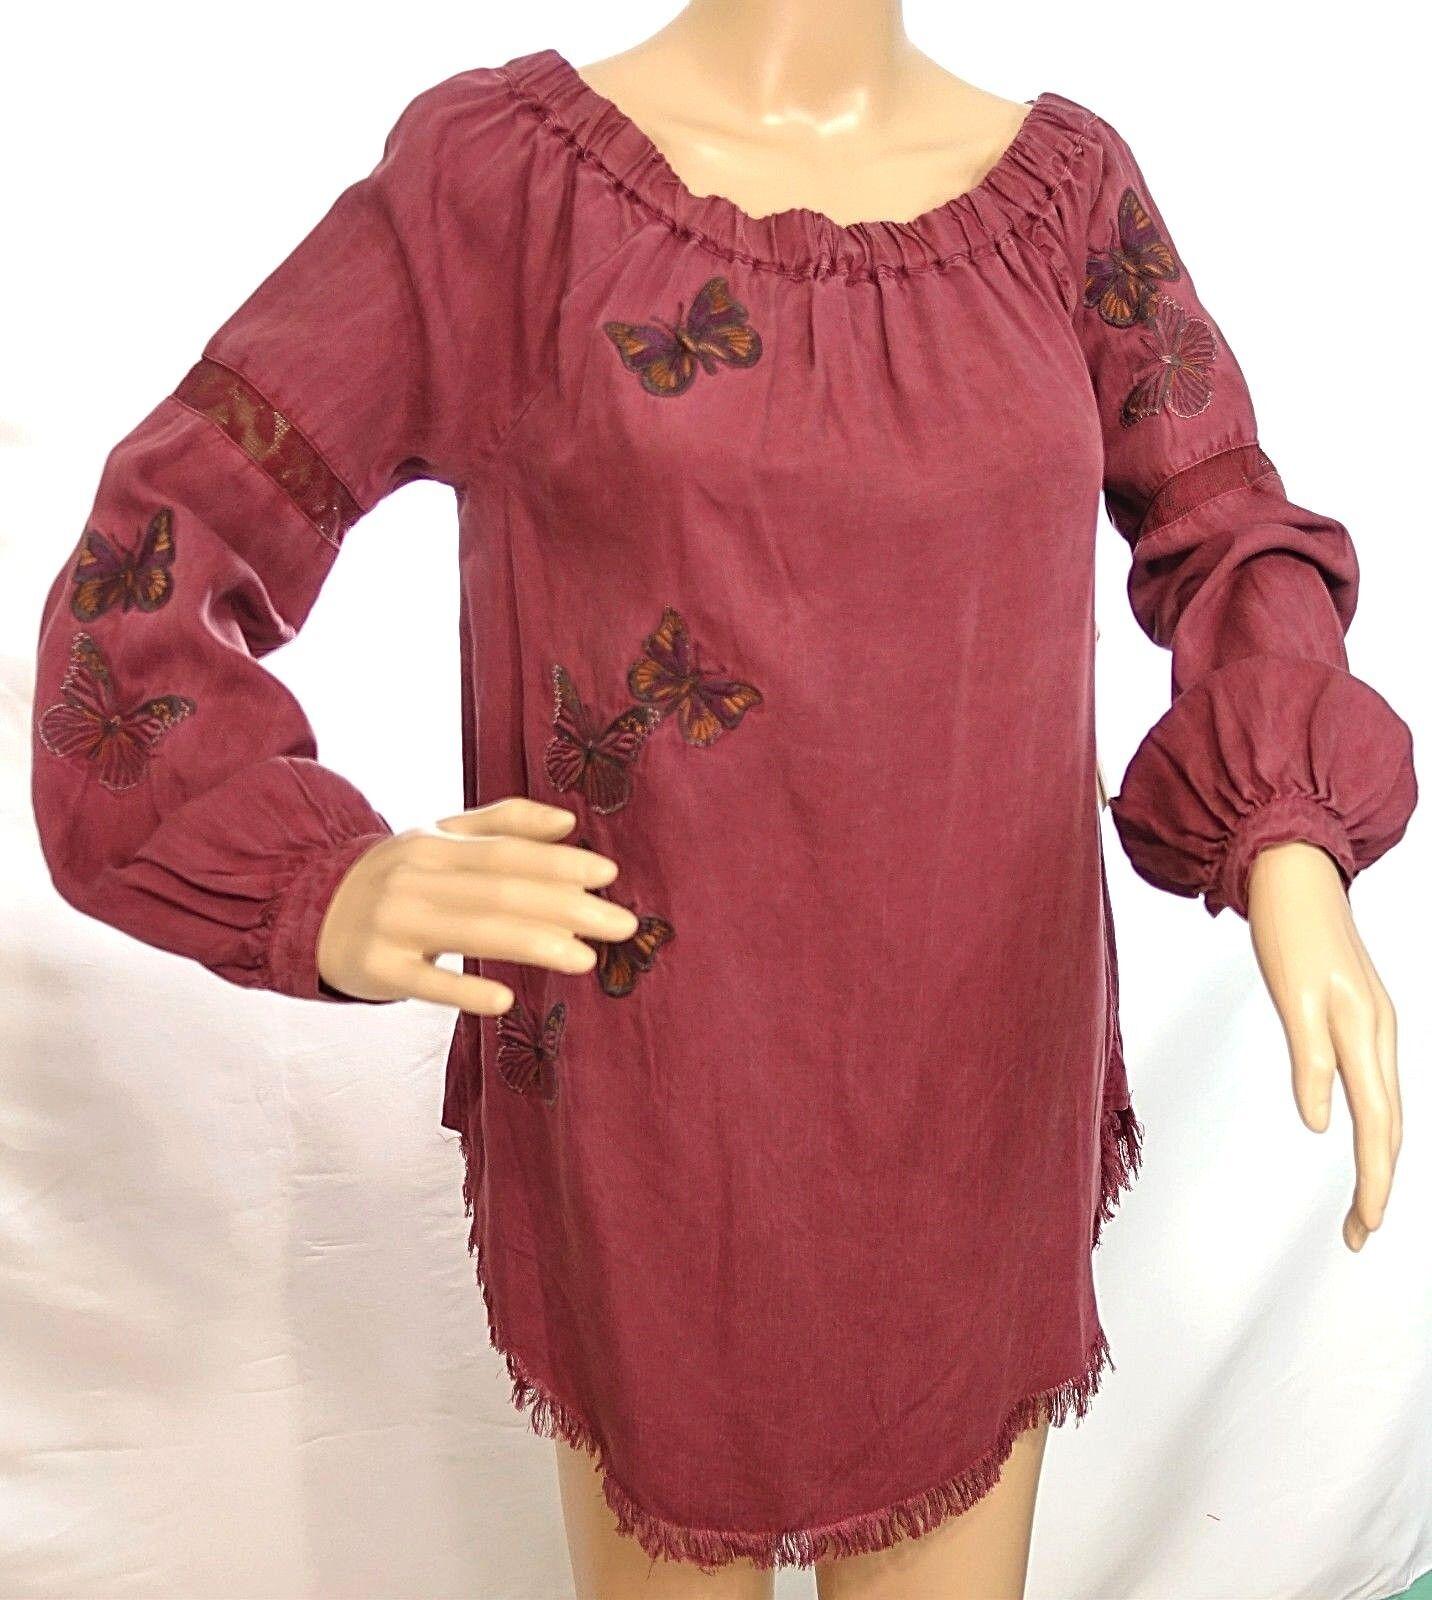 Standard Grace Women Reg Size S Burgundy Butterfly Tunic Top Blouse Shirt Fringe